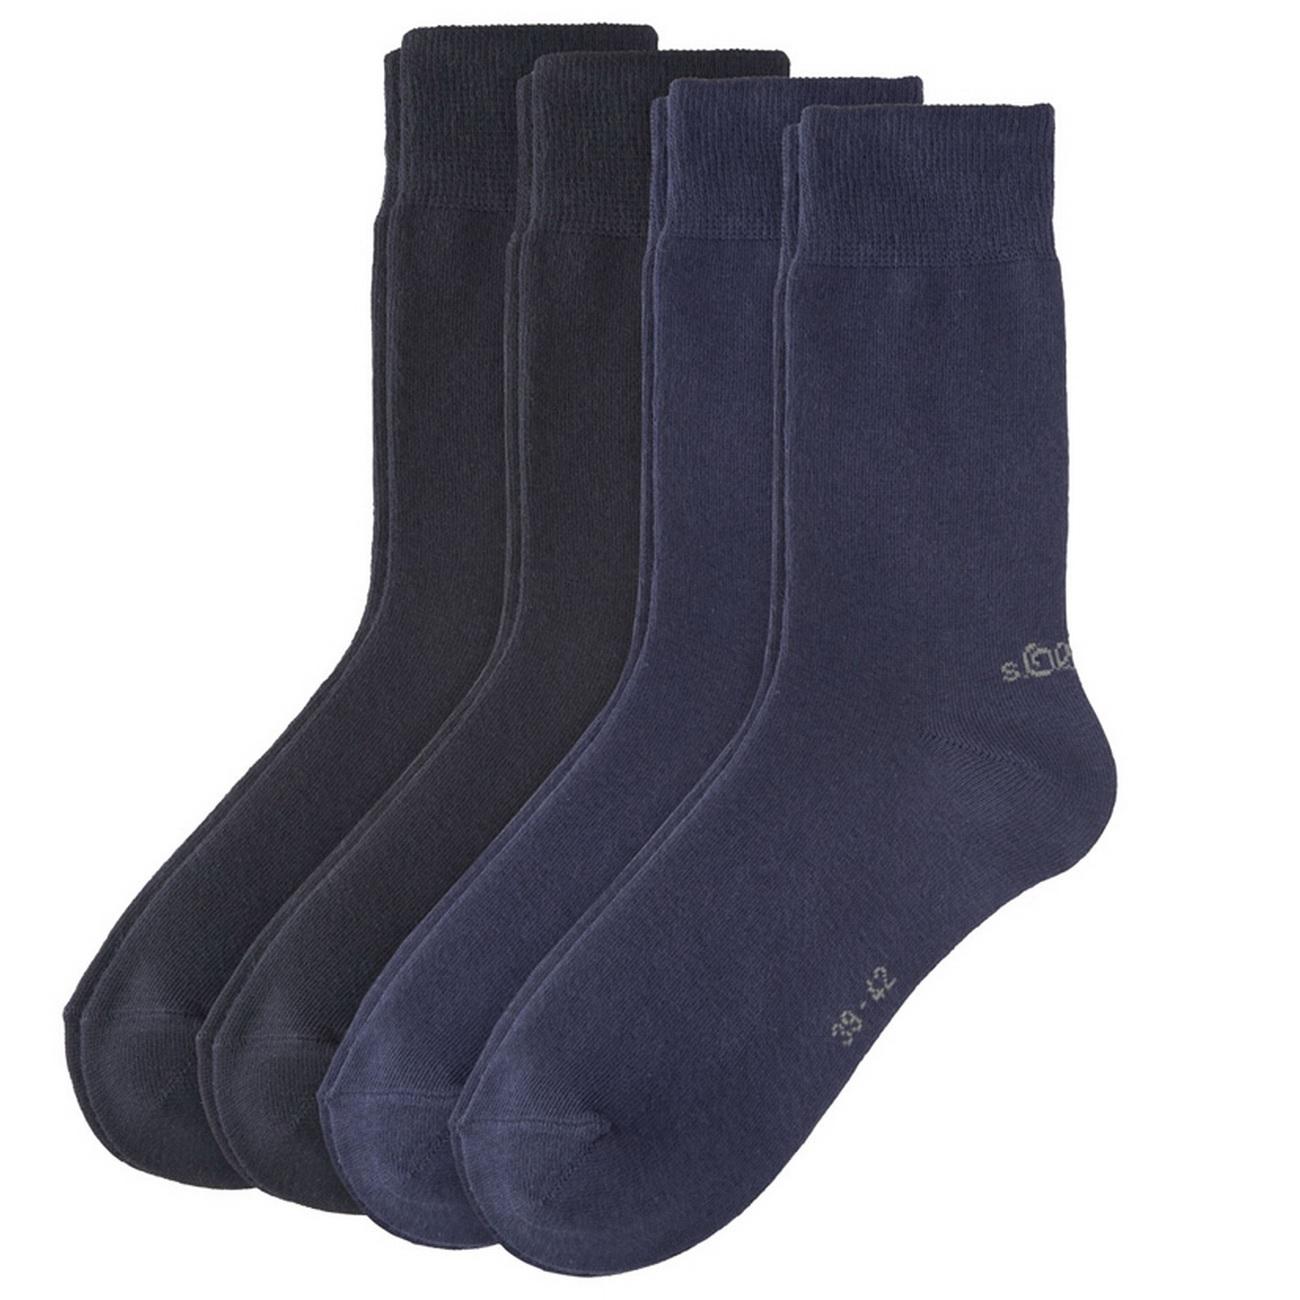 S.Oliver Classic Socken Unisex Business Strümpfe 39-42 43-46 47-49 Herren Damen